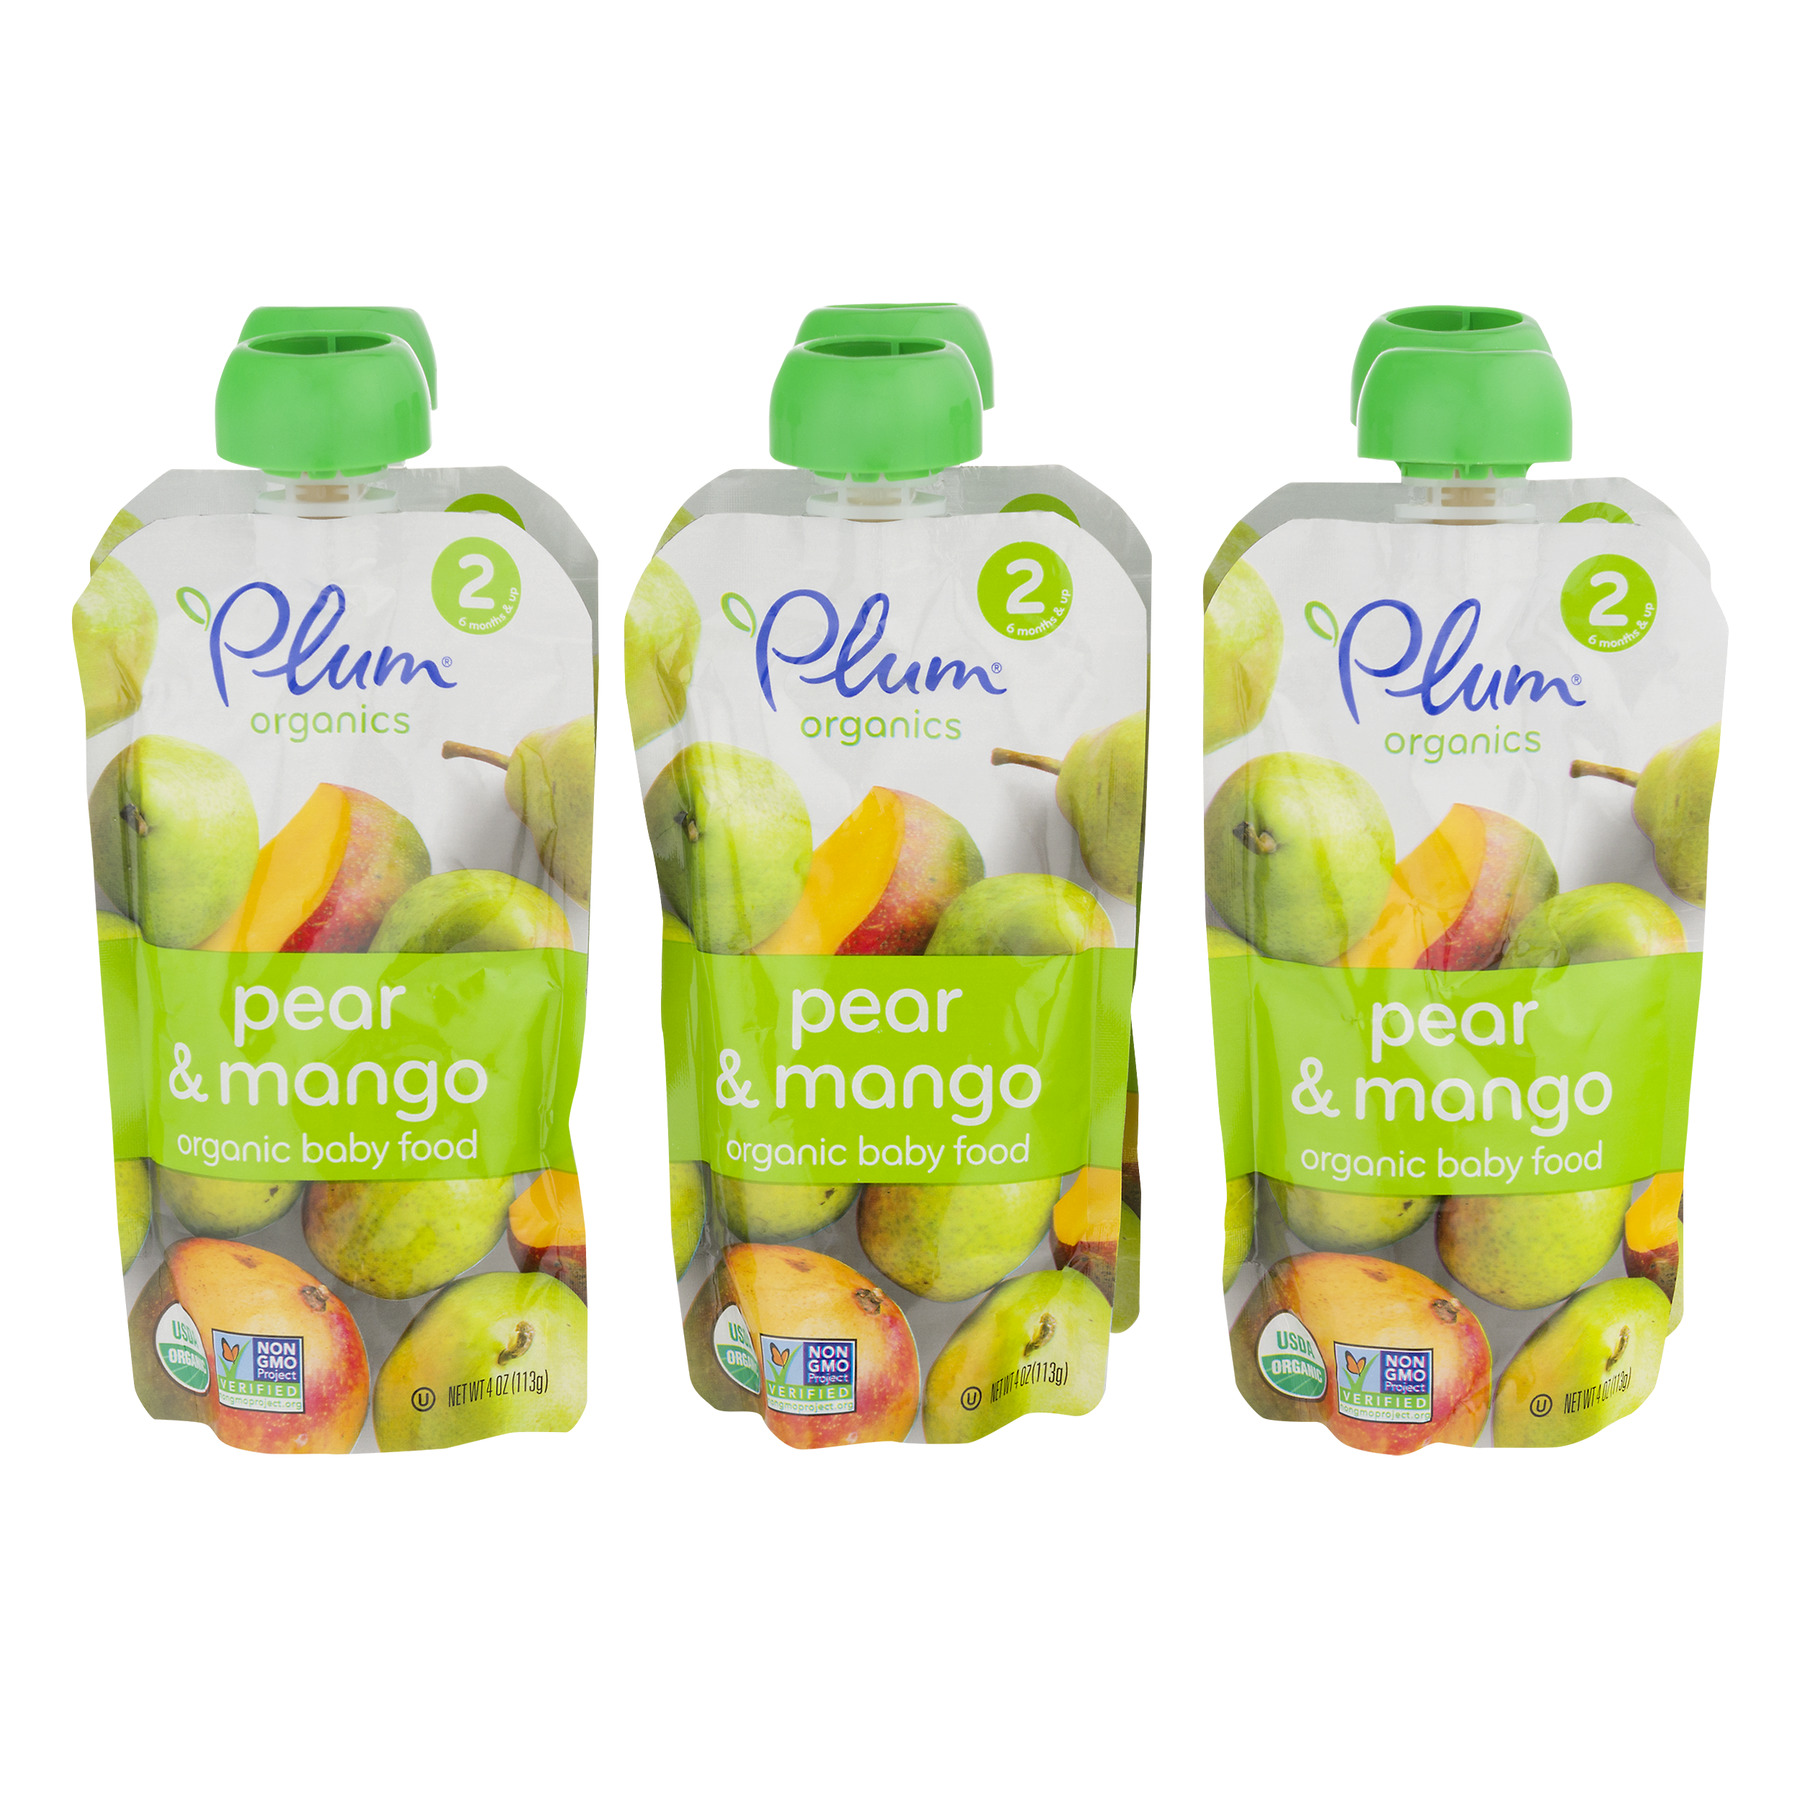 Stage 2 Plum Organics Pear & Mango 6PK